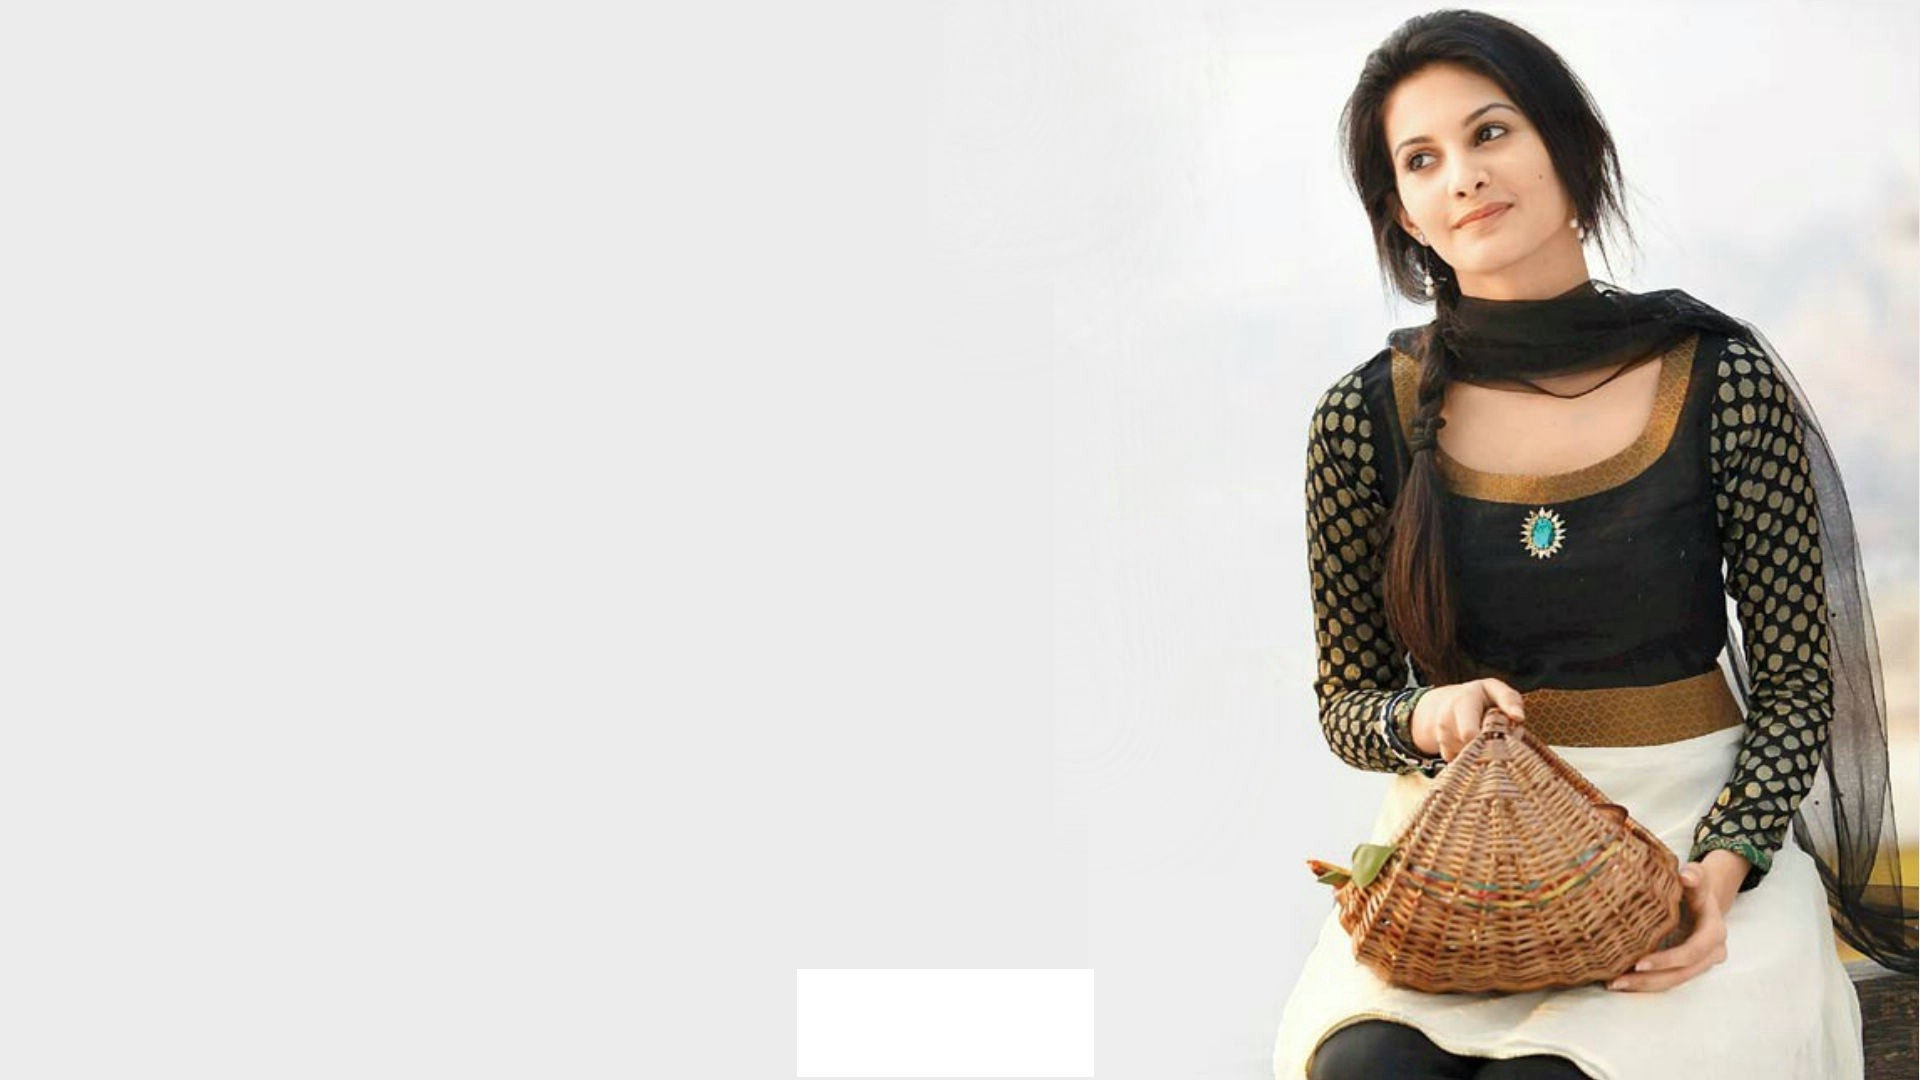 Amyra Dastur sexy images